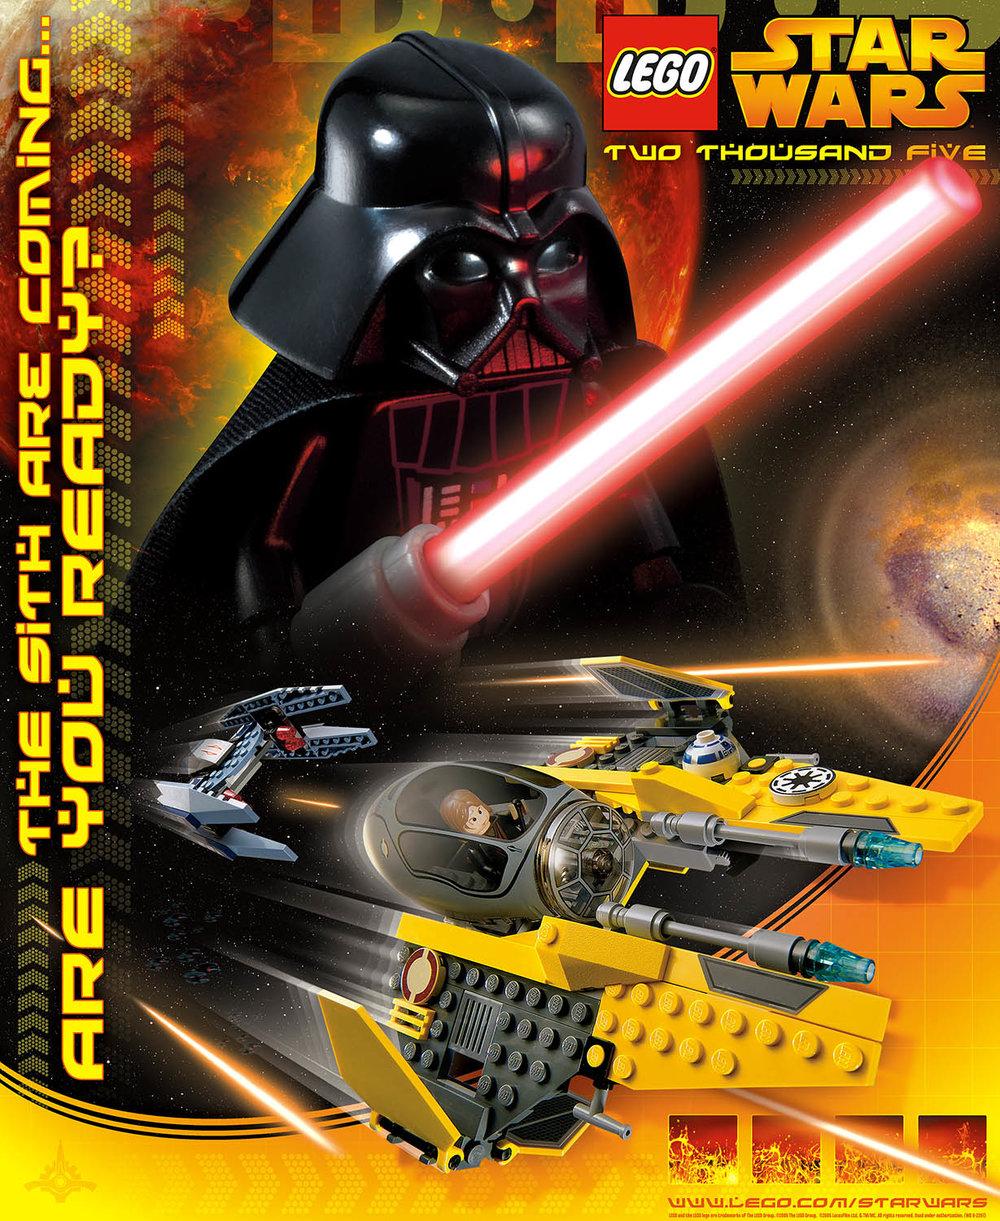 Lego Star Wars, Promotional